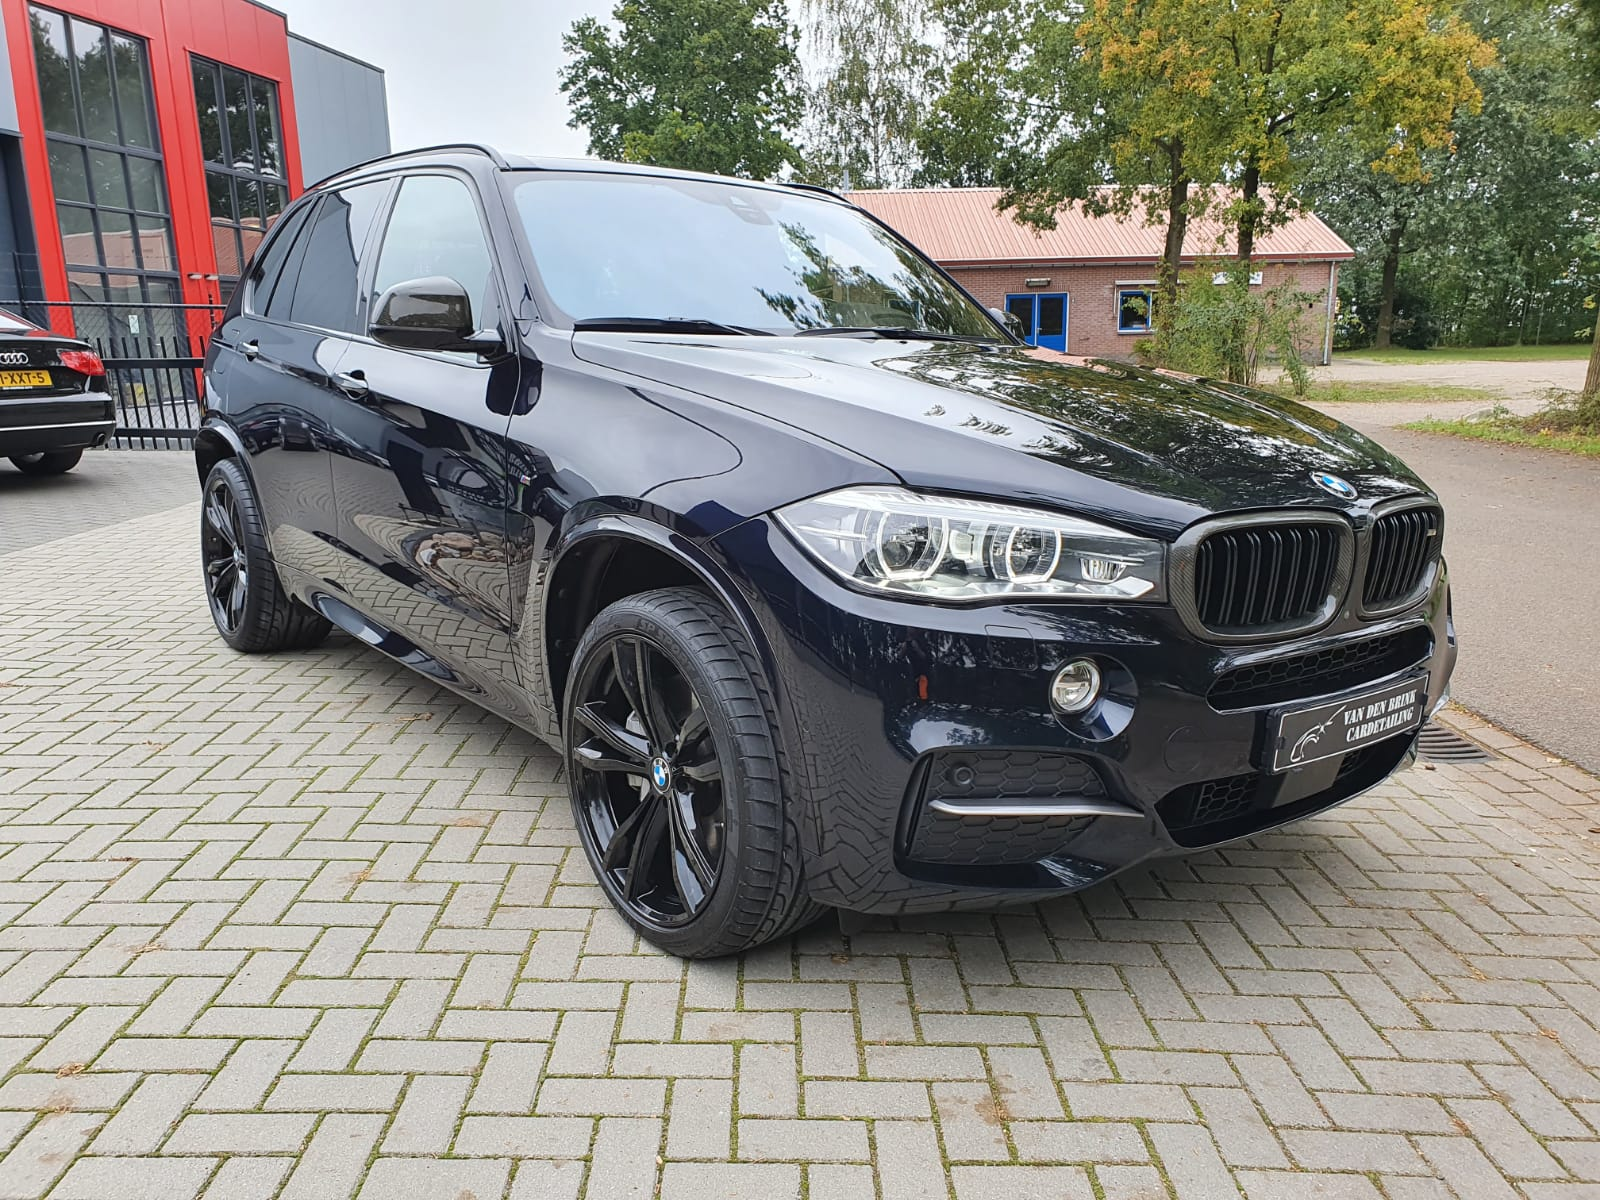 BMW X5 glascoating